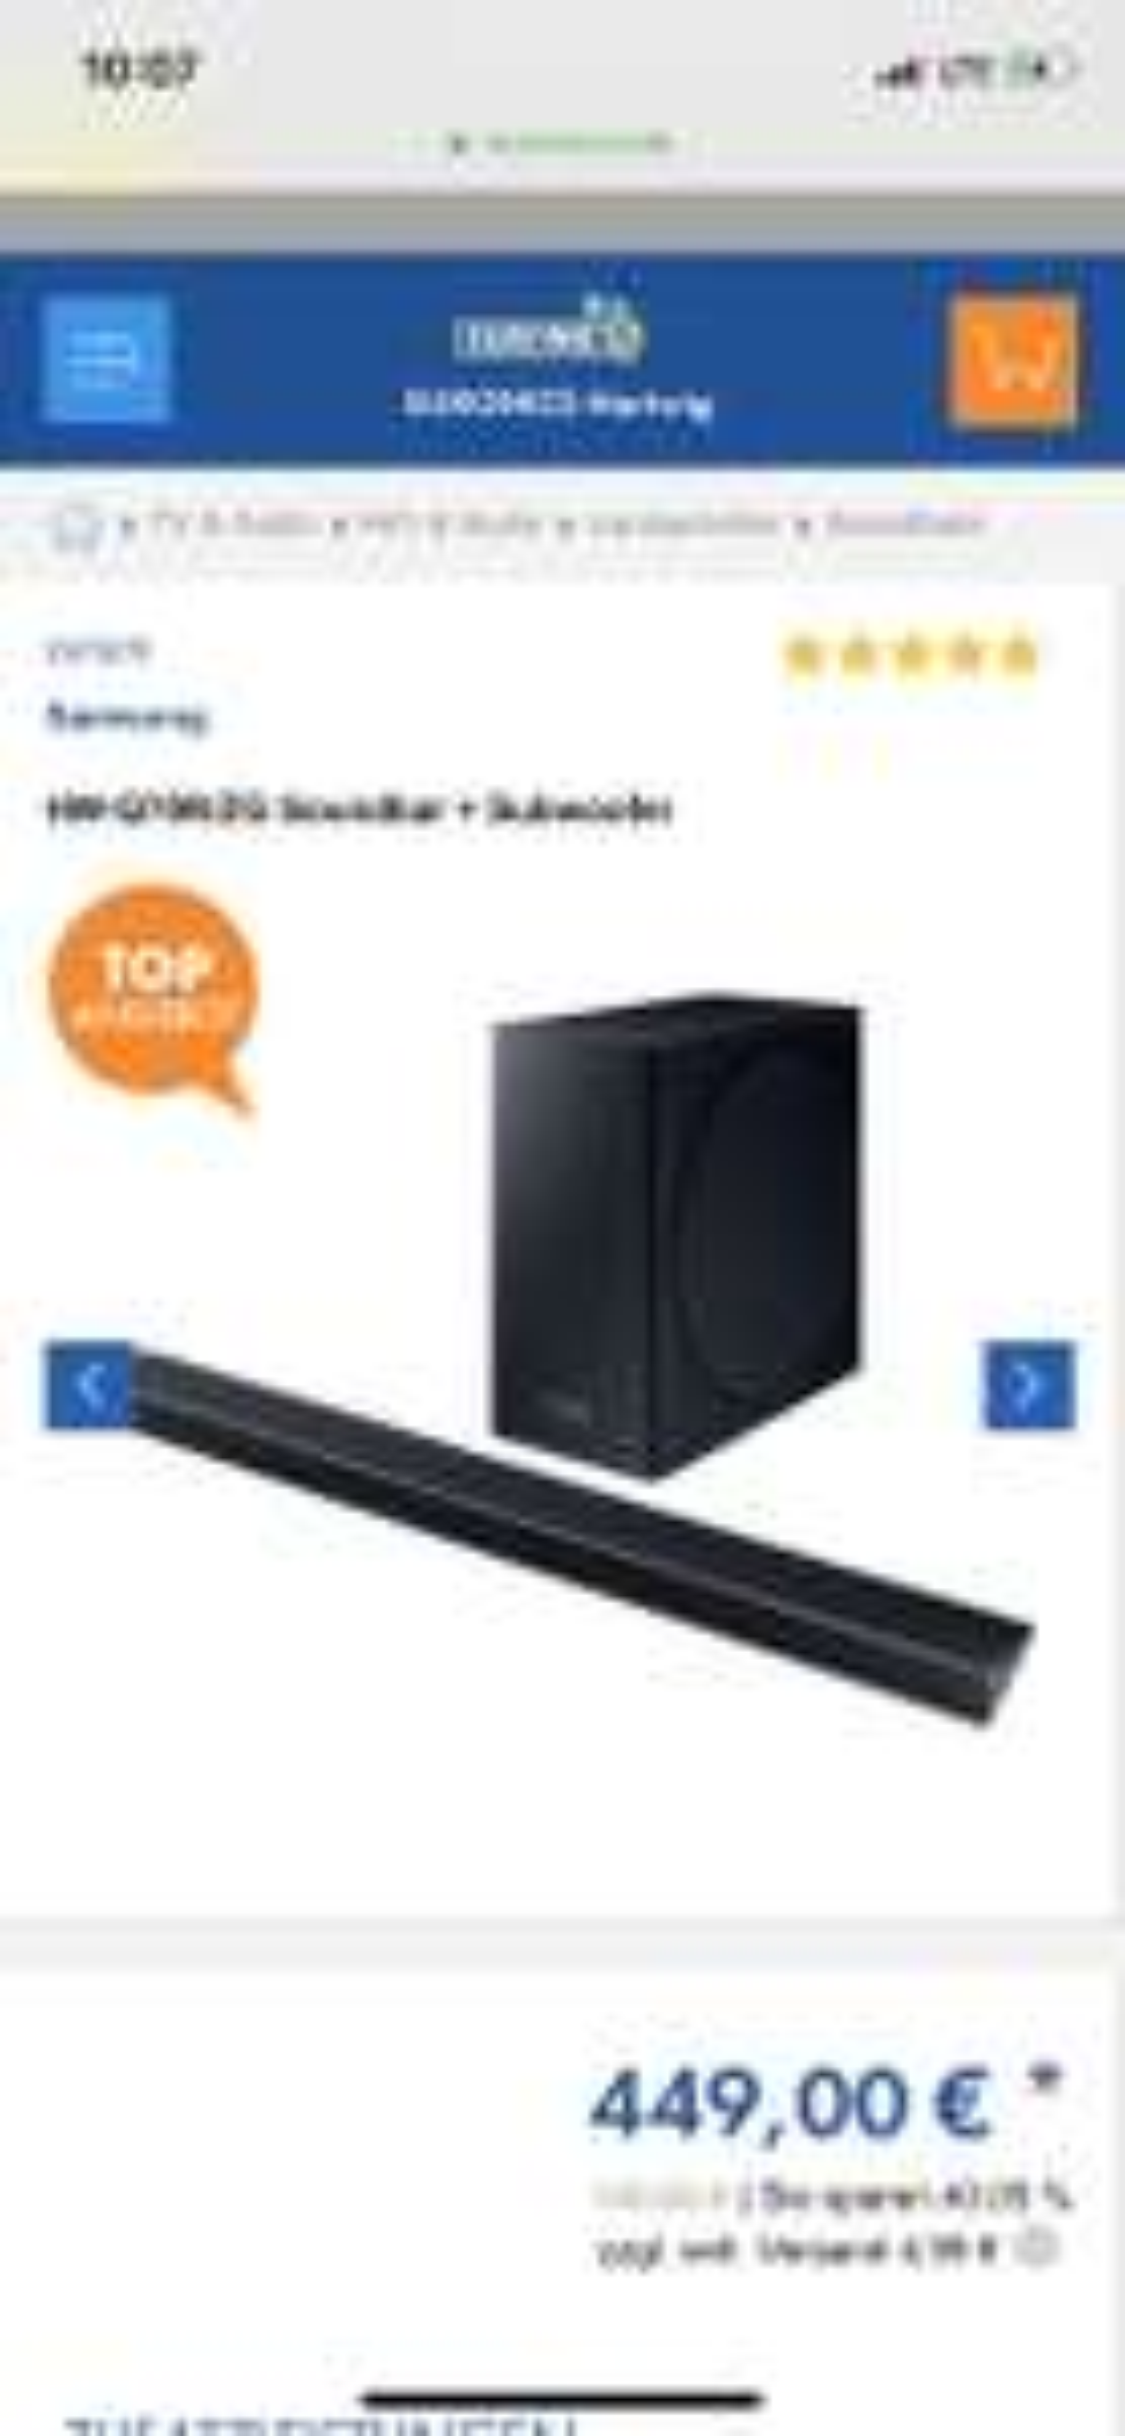 Samsung HW-Q70R/ZG Soundbar + Subwoofer